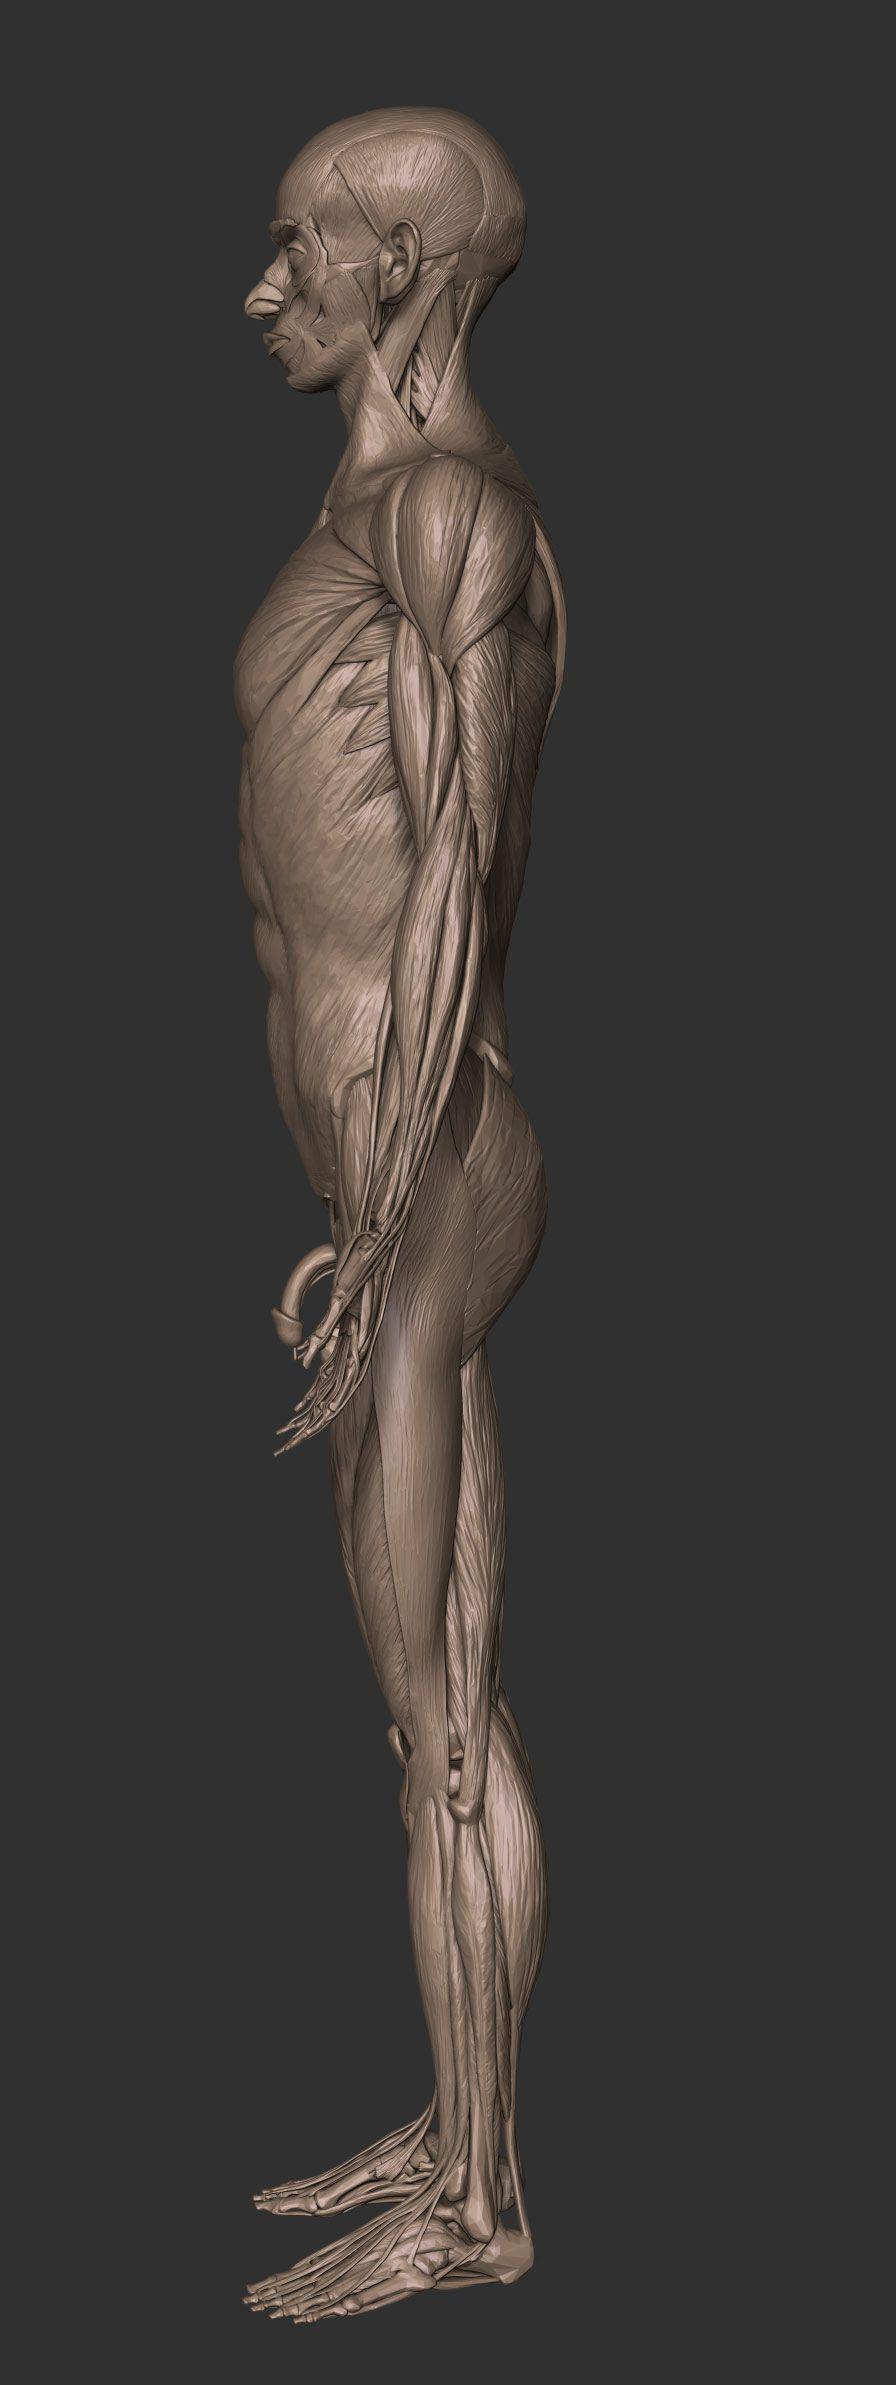 Full Anatomy Model Free Download Zbrushtuts Anatomy Pinterest